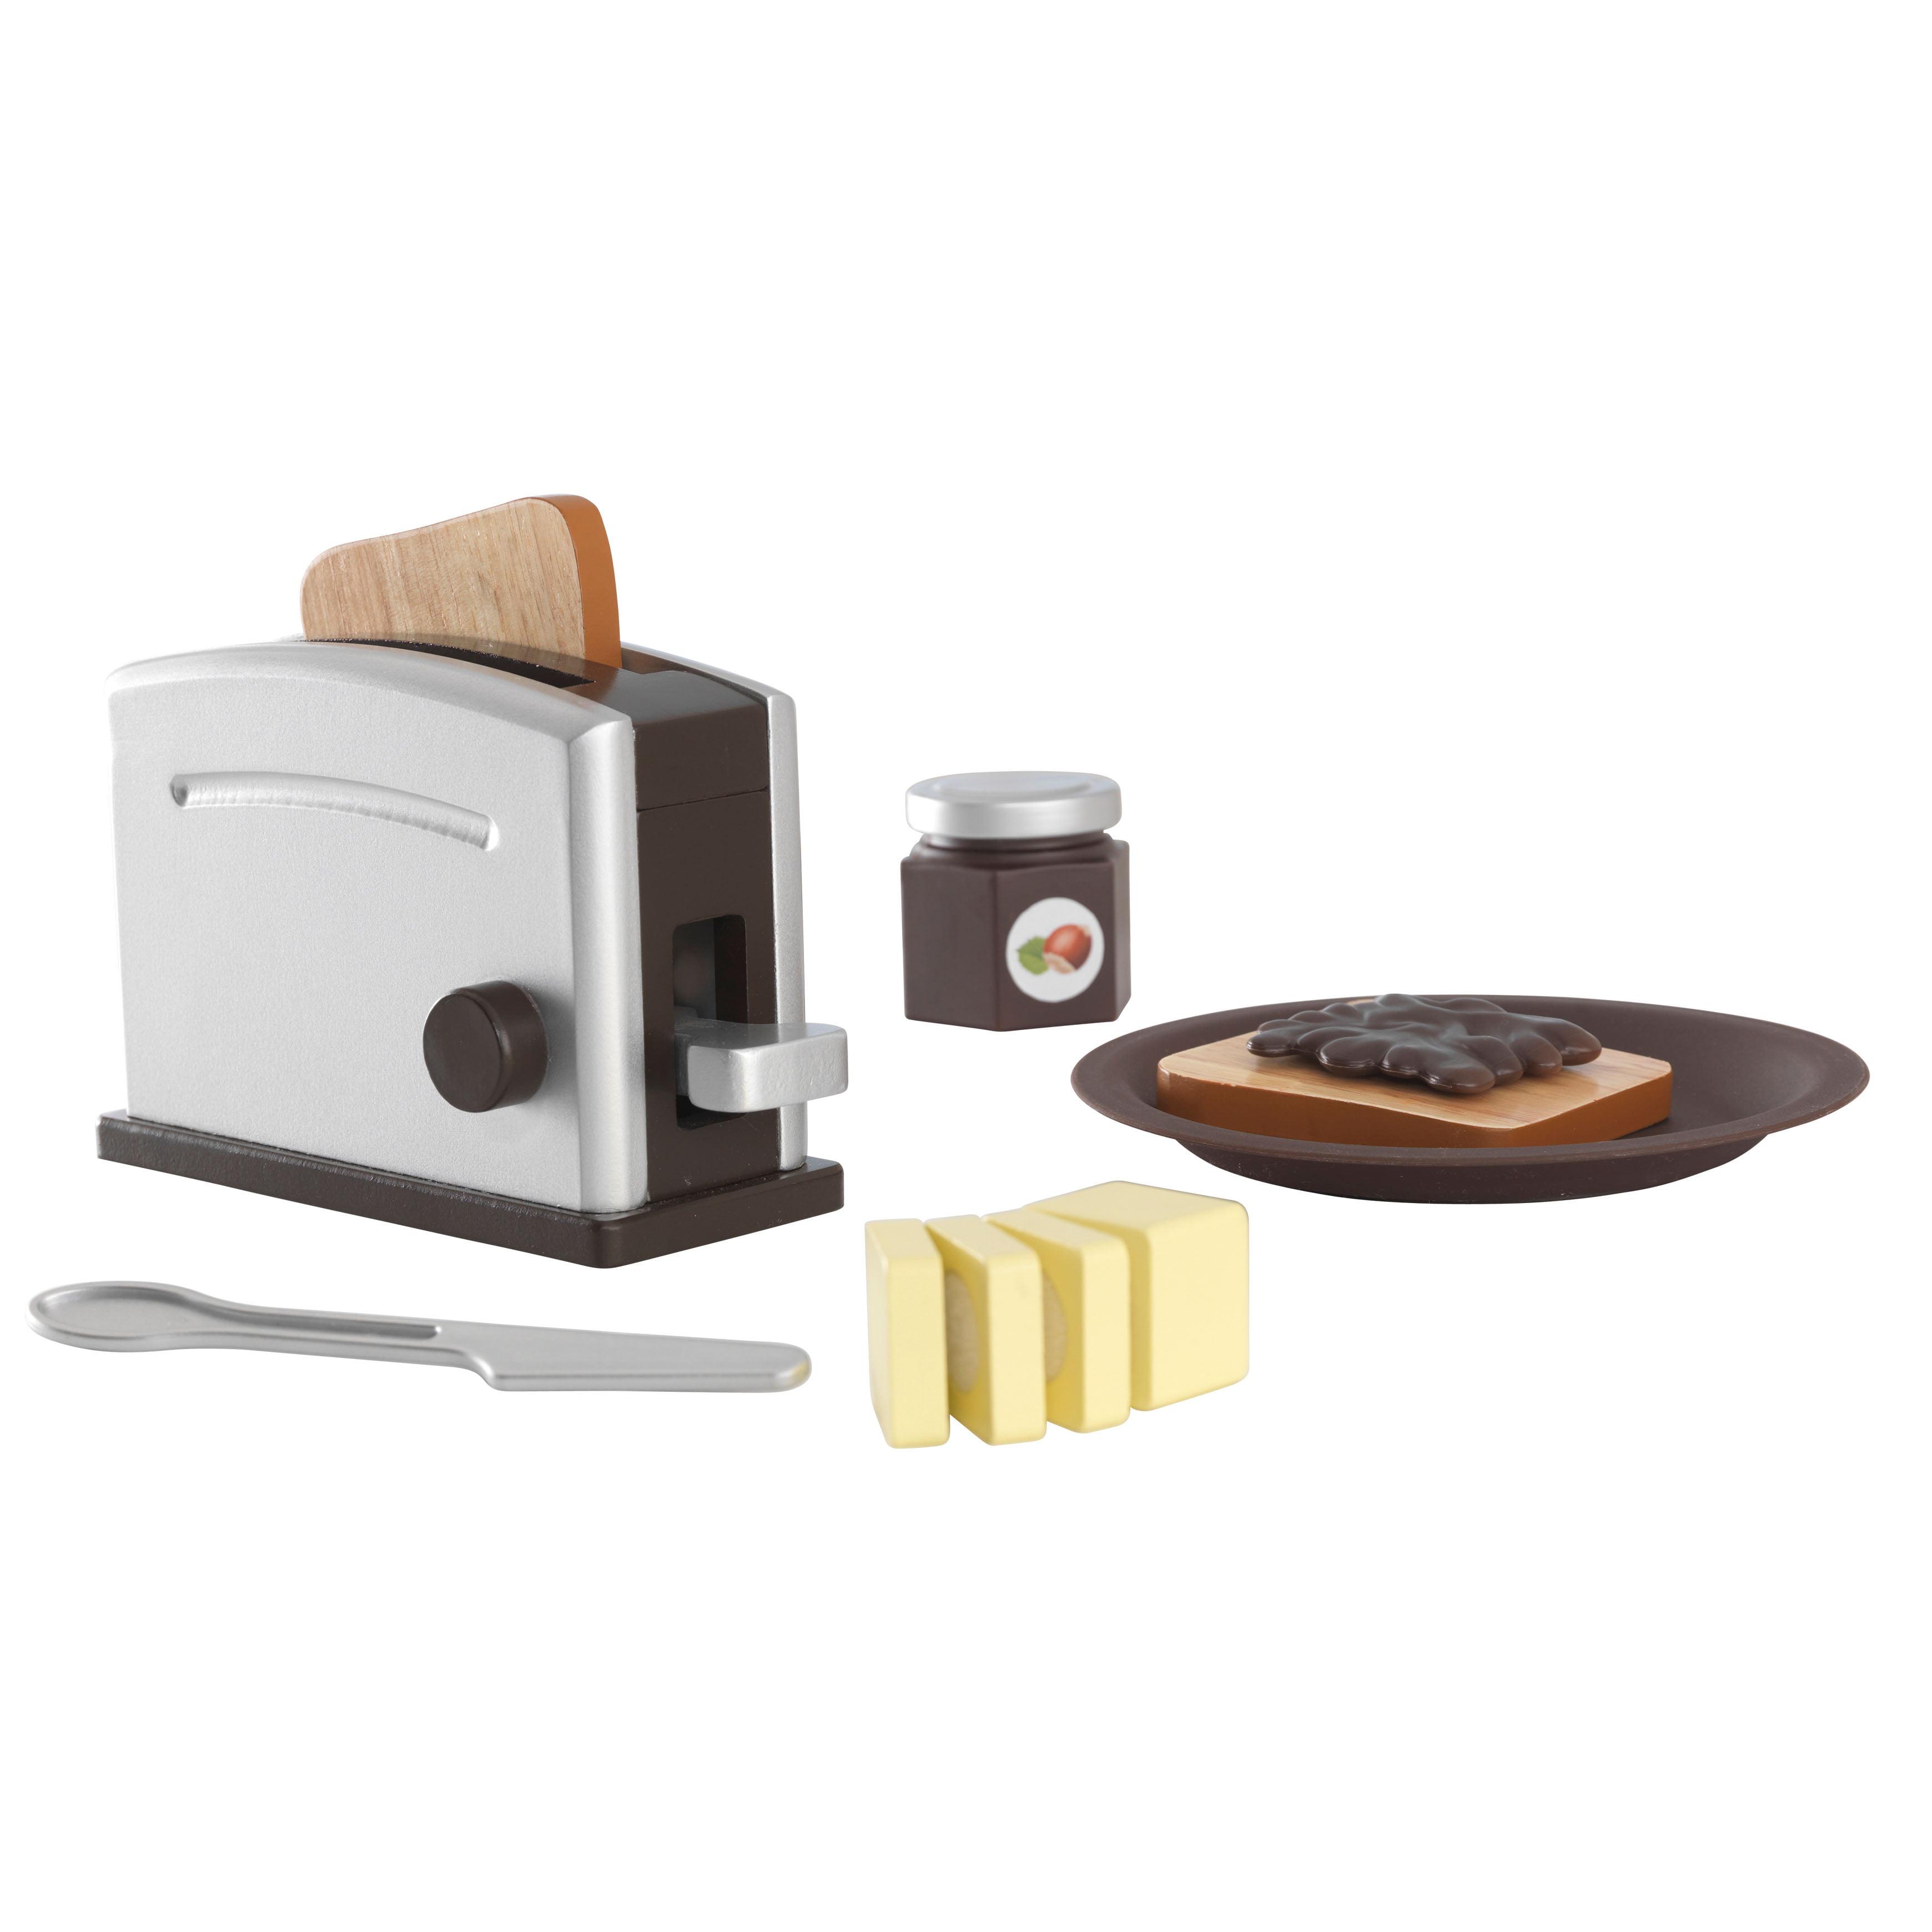 KidKraft Espresso Toaster Set by KidKraft